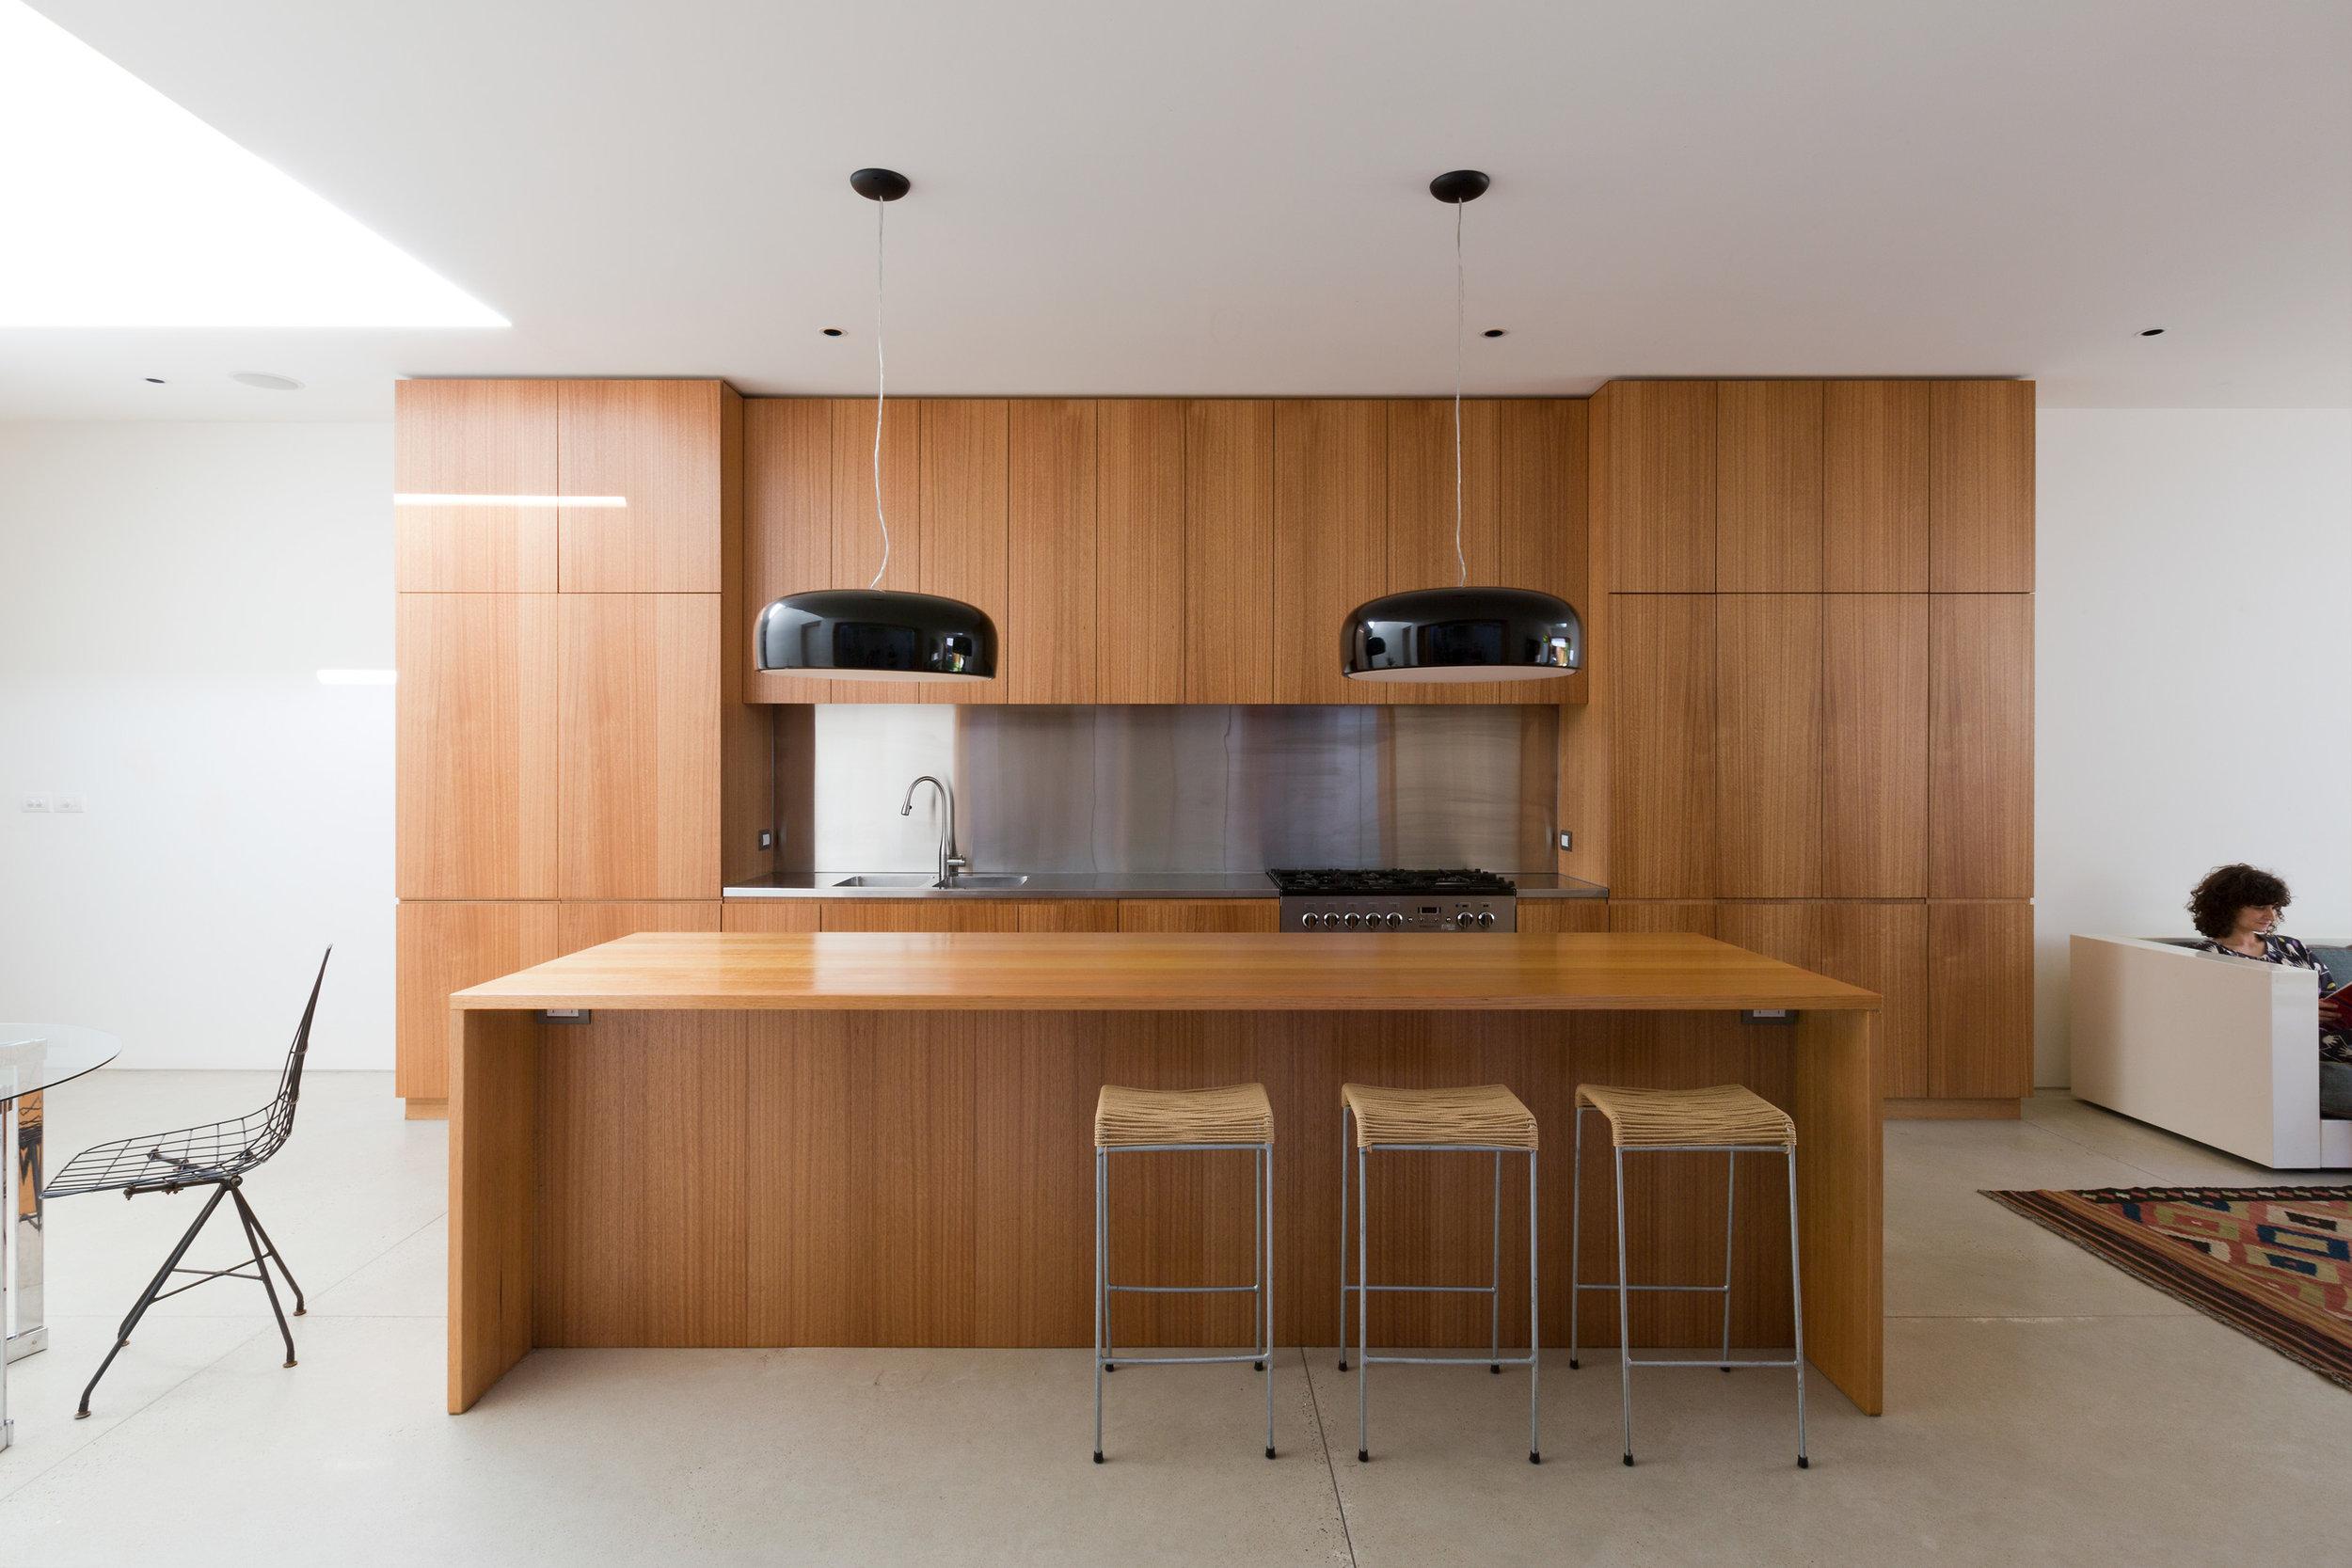 bondi house 03.jpg